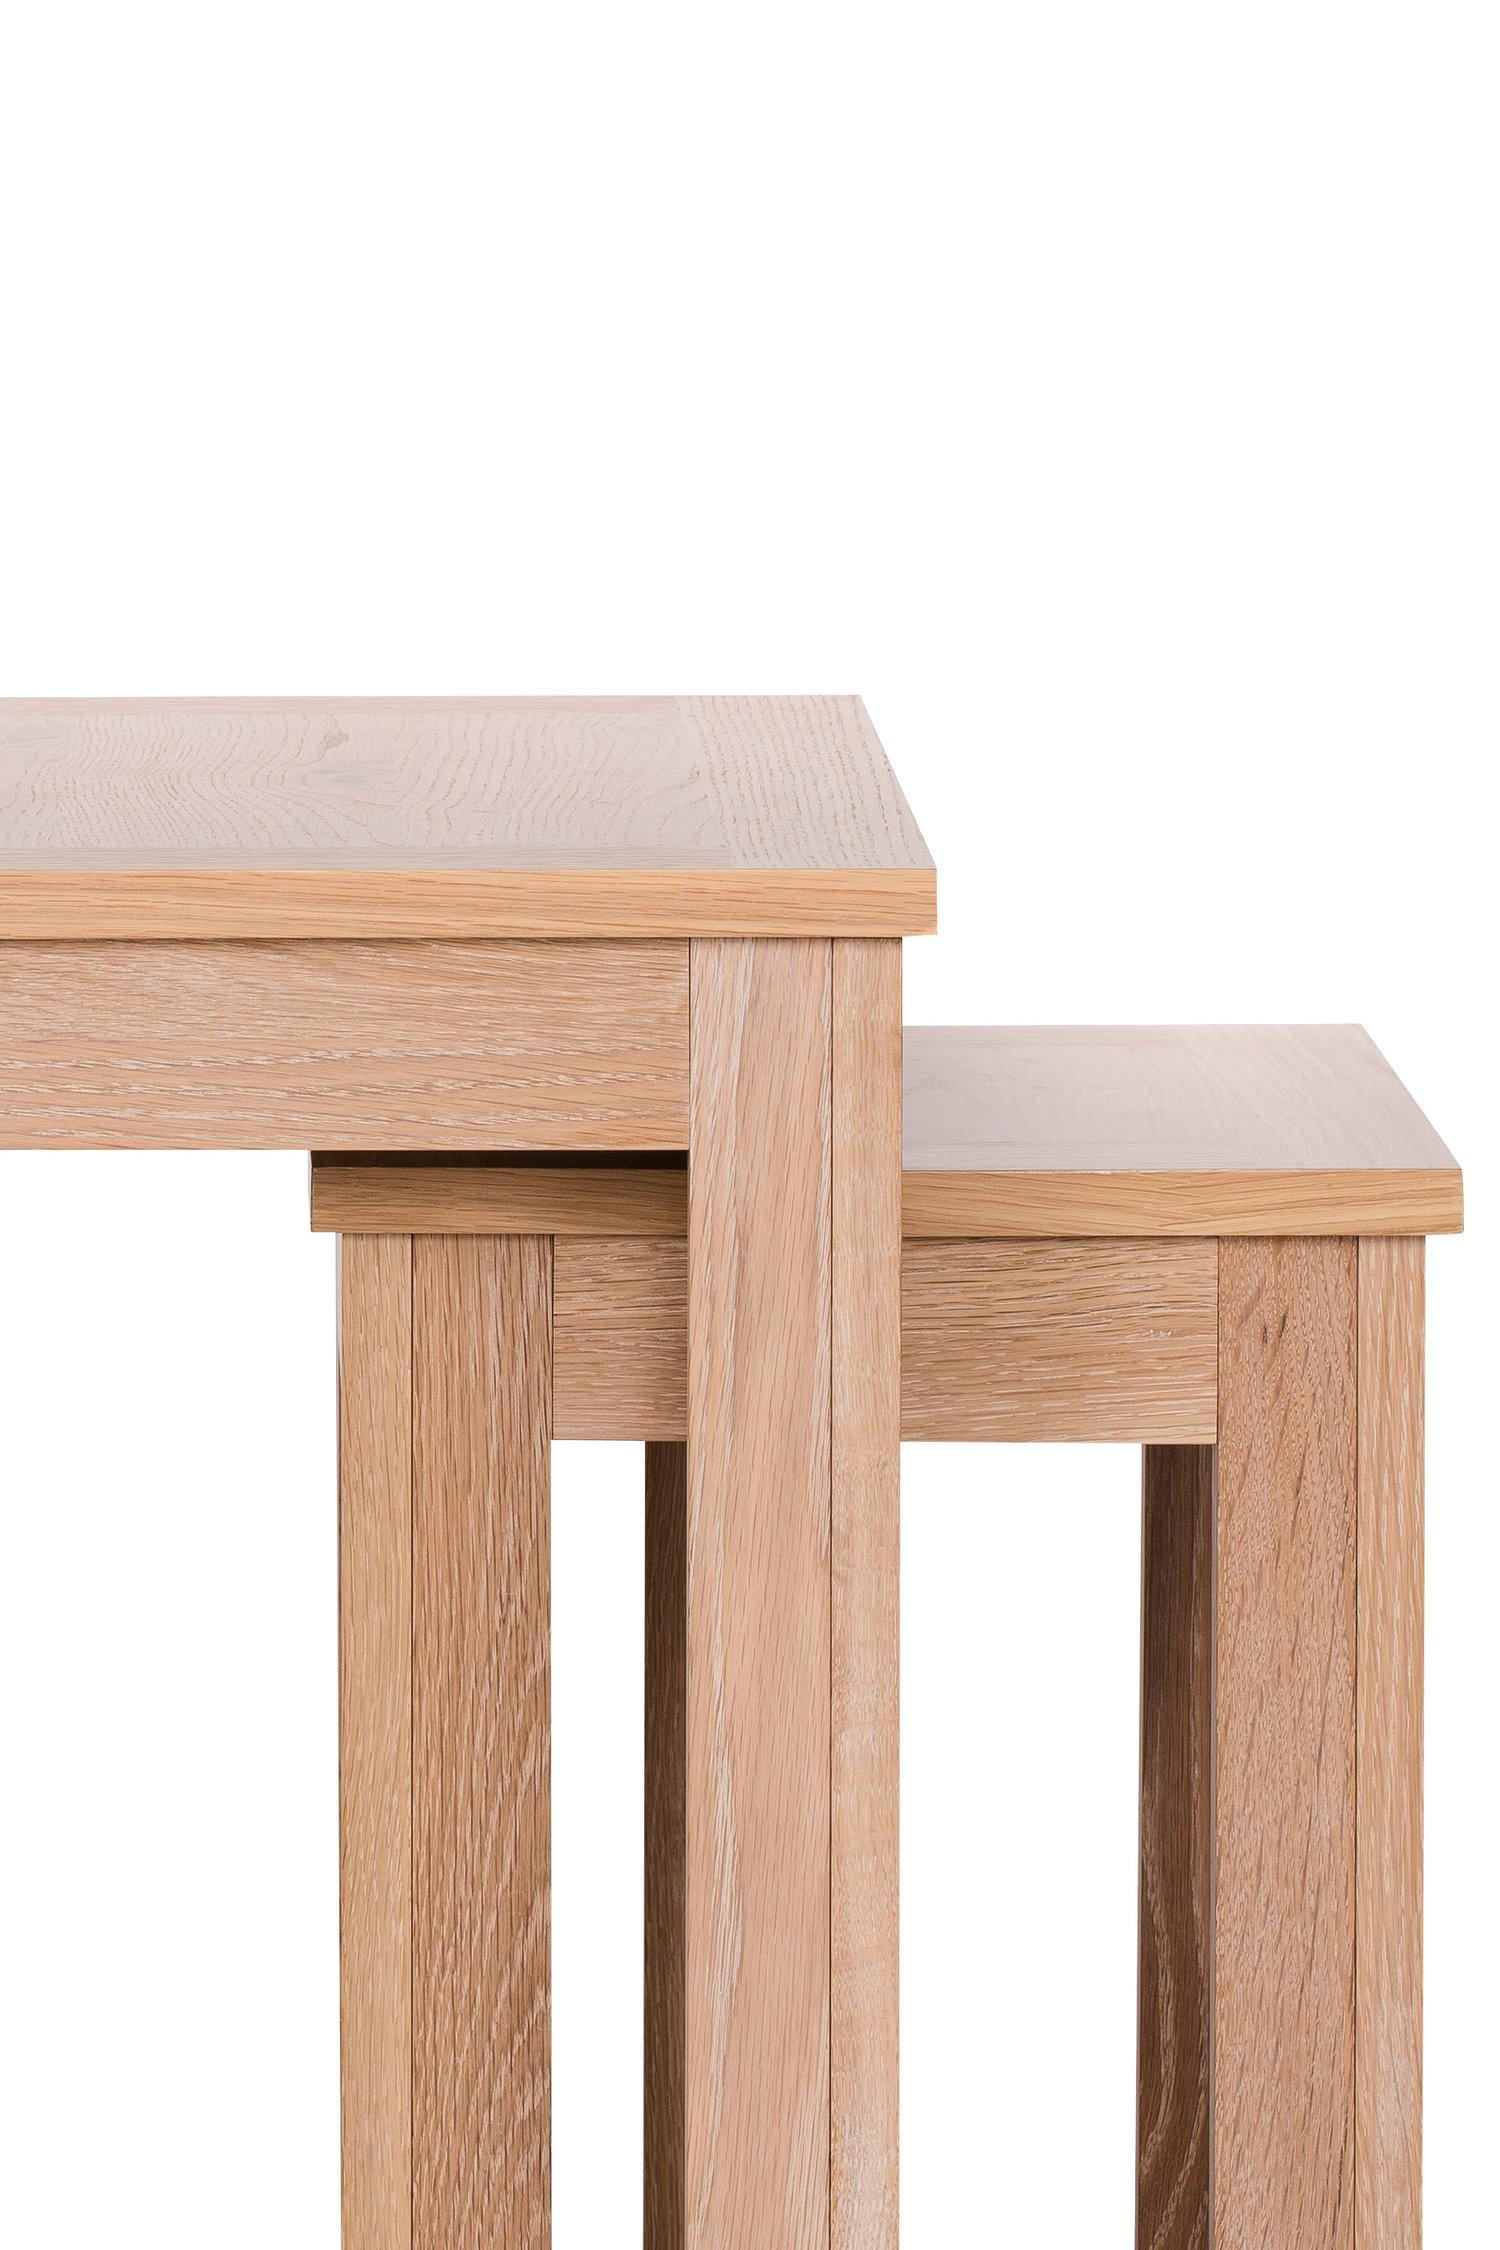 Simple_Furniture_product_TBP_6.jpg